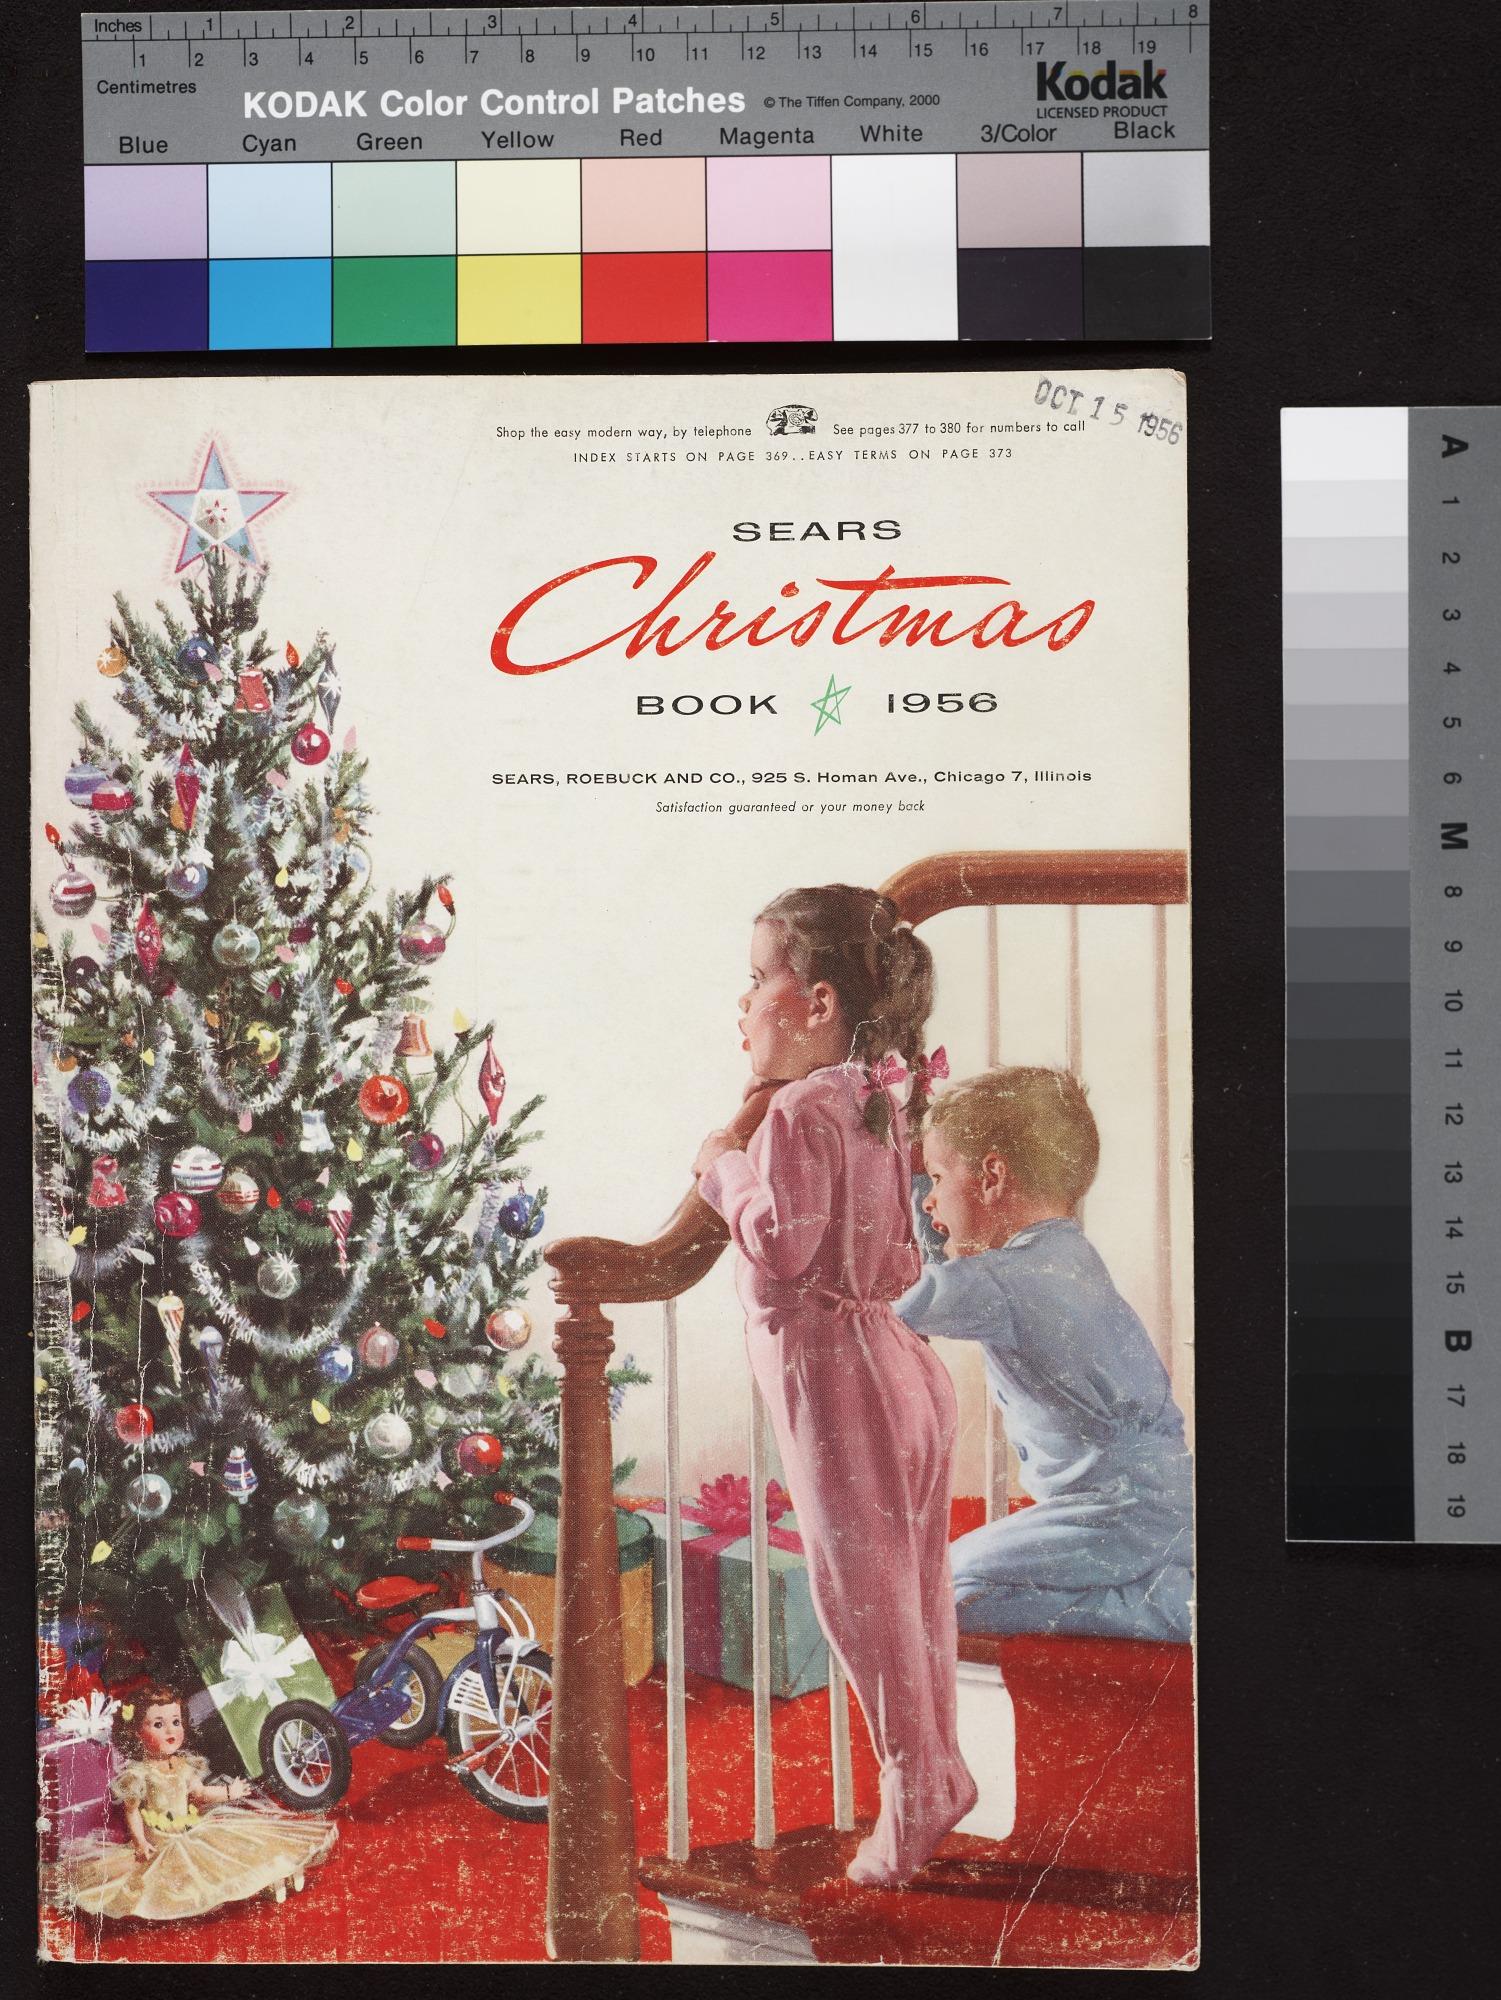 Sears Christmas Photos.Cover Of Sears Christmas Book 1956